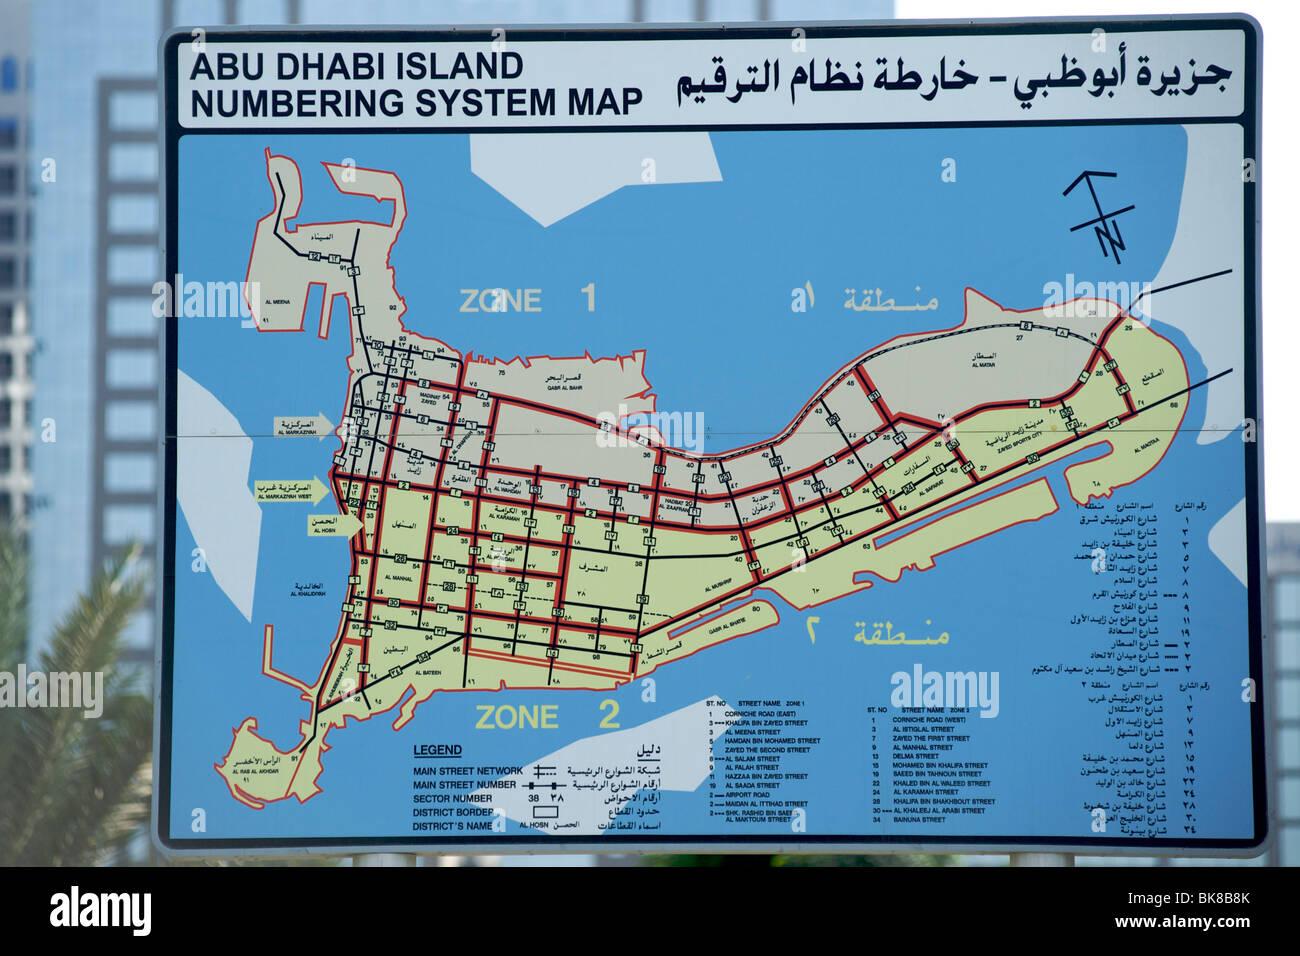 Abu Dhabi Map Stock Photos & Abu Dhabi Map Stock Images - Alamy